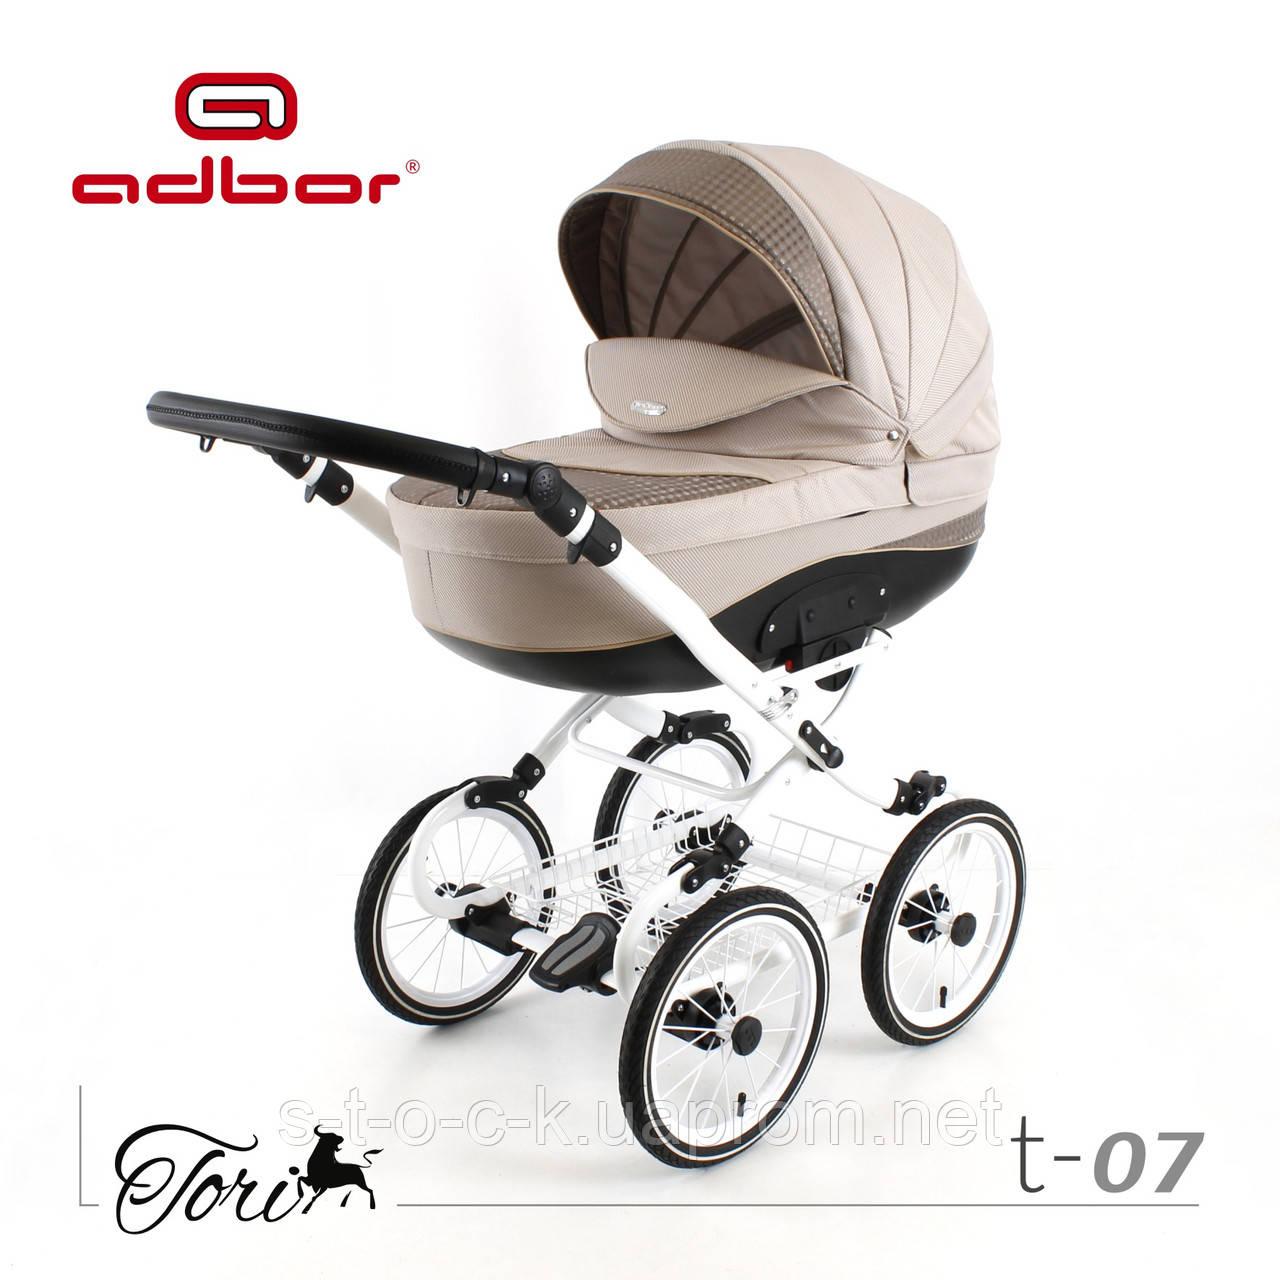 "Коляска ADBOR TORI 3w1  Classic 14"" колёса.Новинка 2017  года"